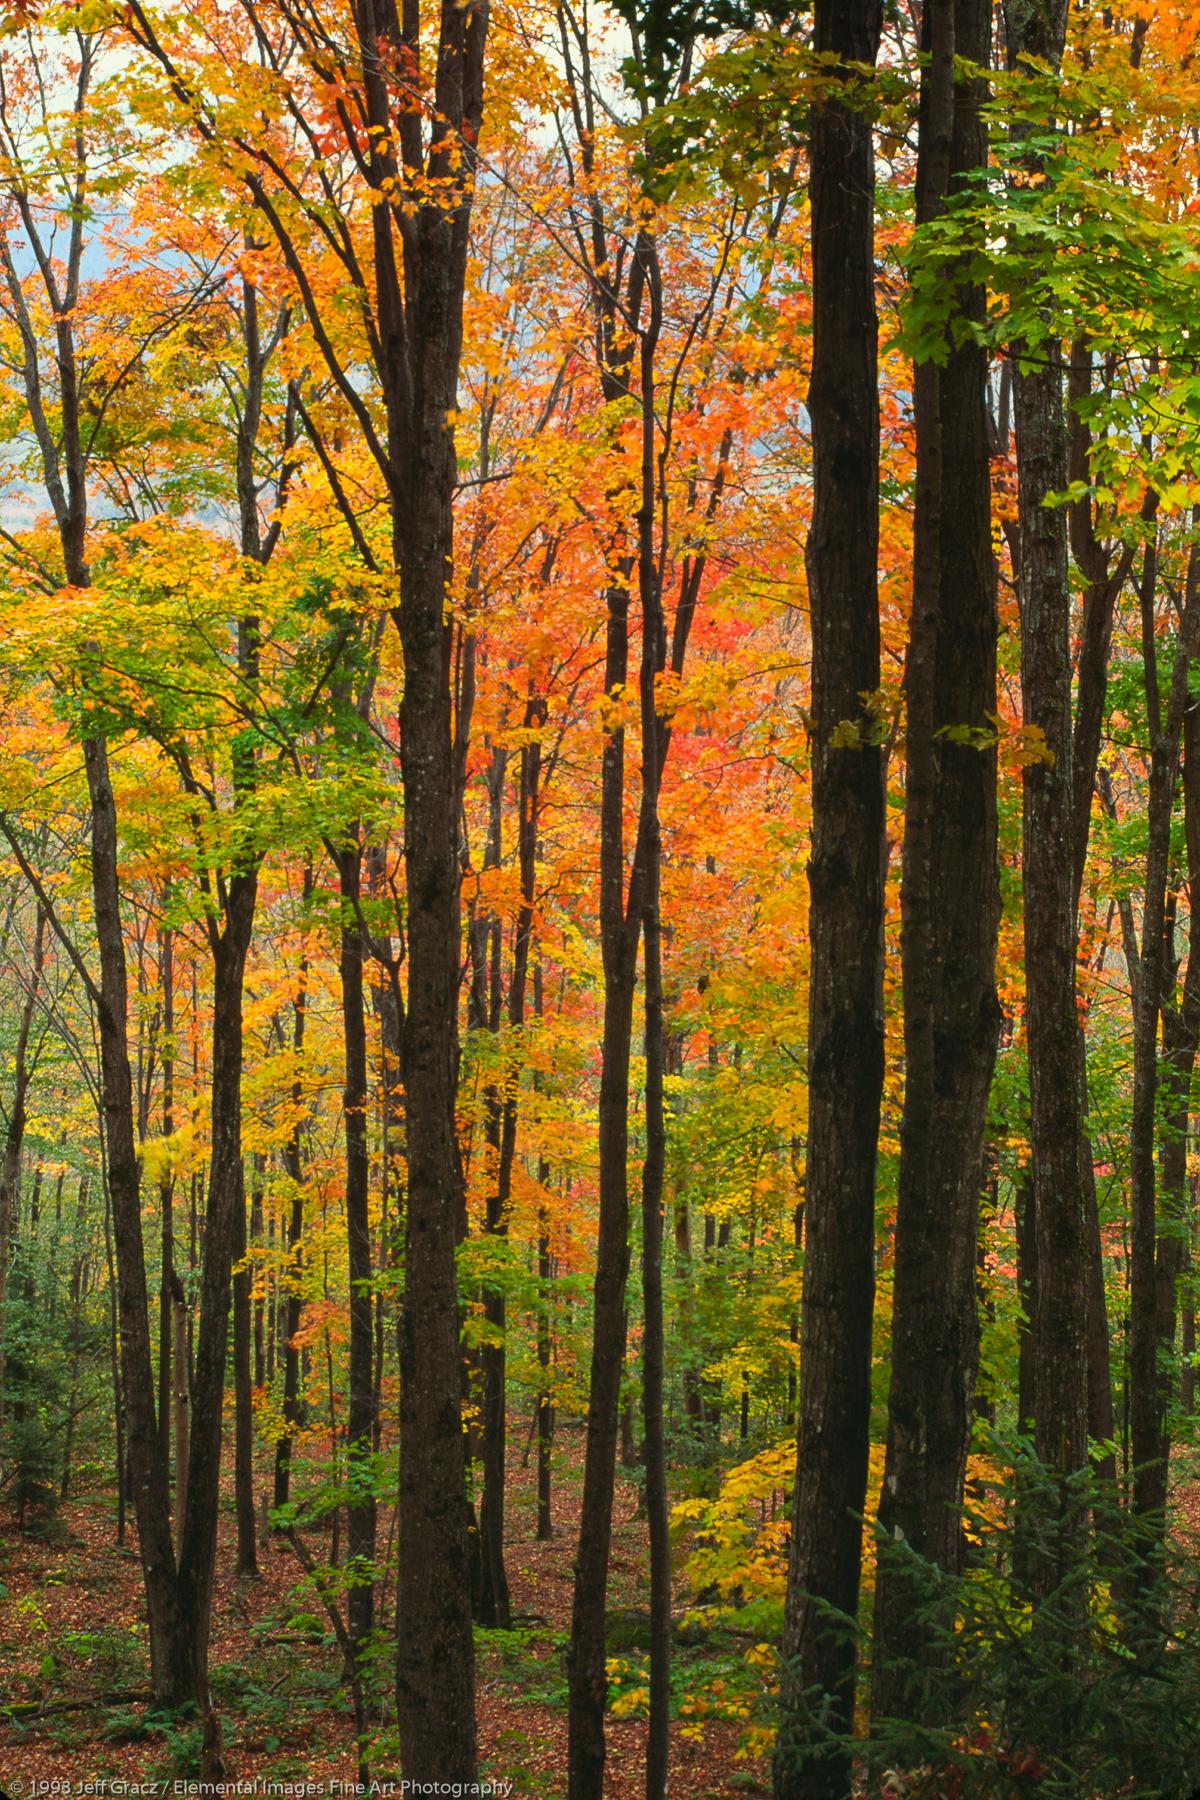 autumn foliage, tree trunks, near john's brook   adirondack state park   NY   usa - © © 1993 Jeff Gracz / Elemental Images Fine Art Photography - All Rights Reserved Worldwide